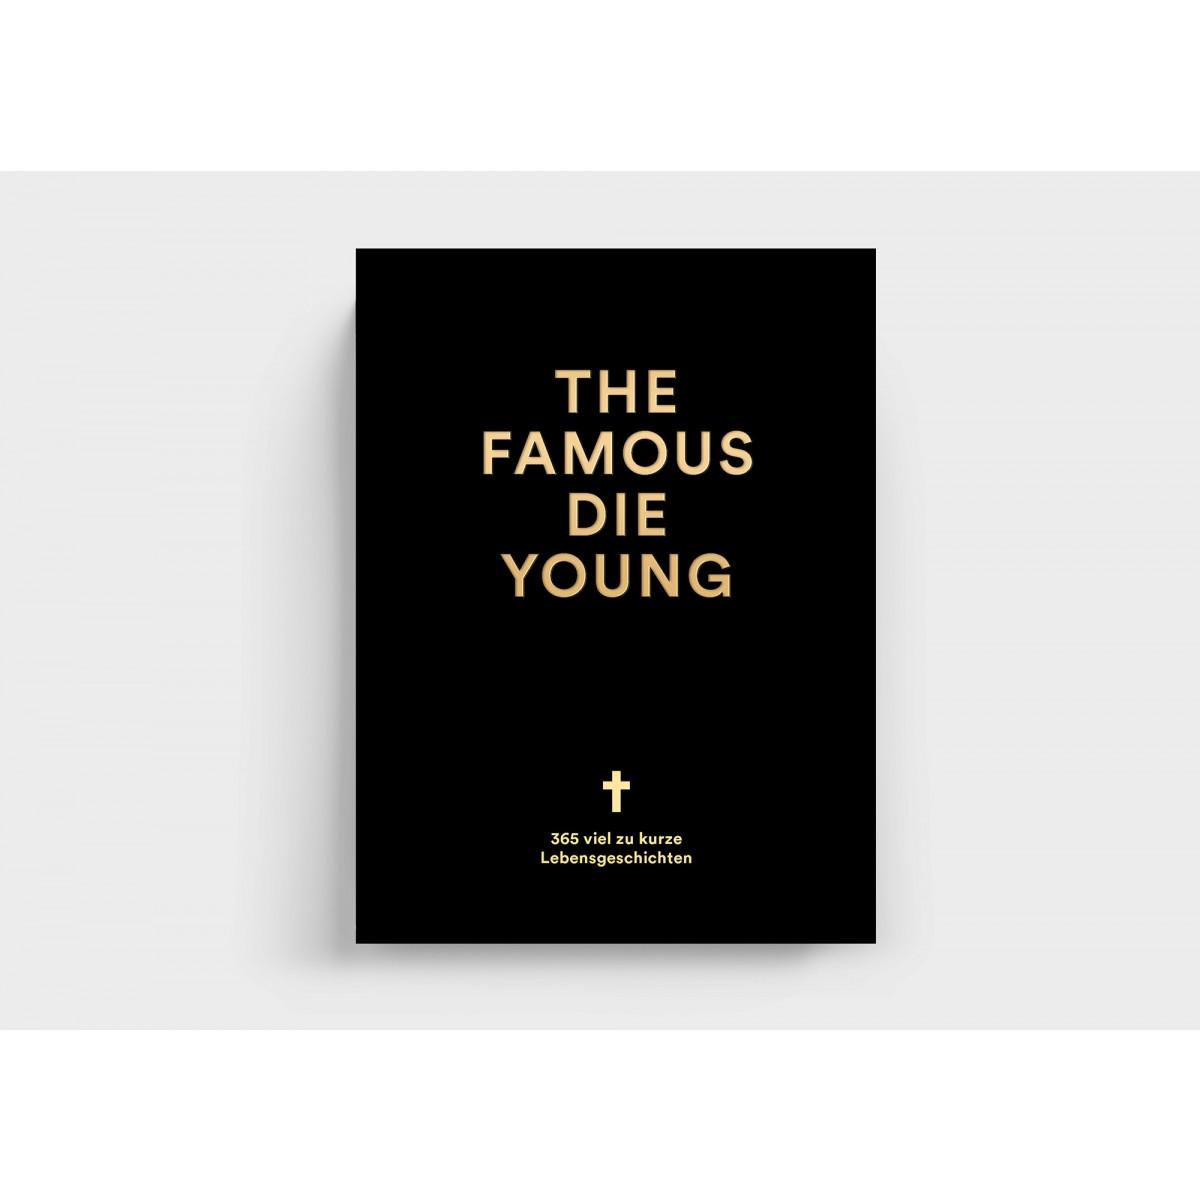 The Famous Die Young von seltmann+söhne